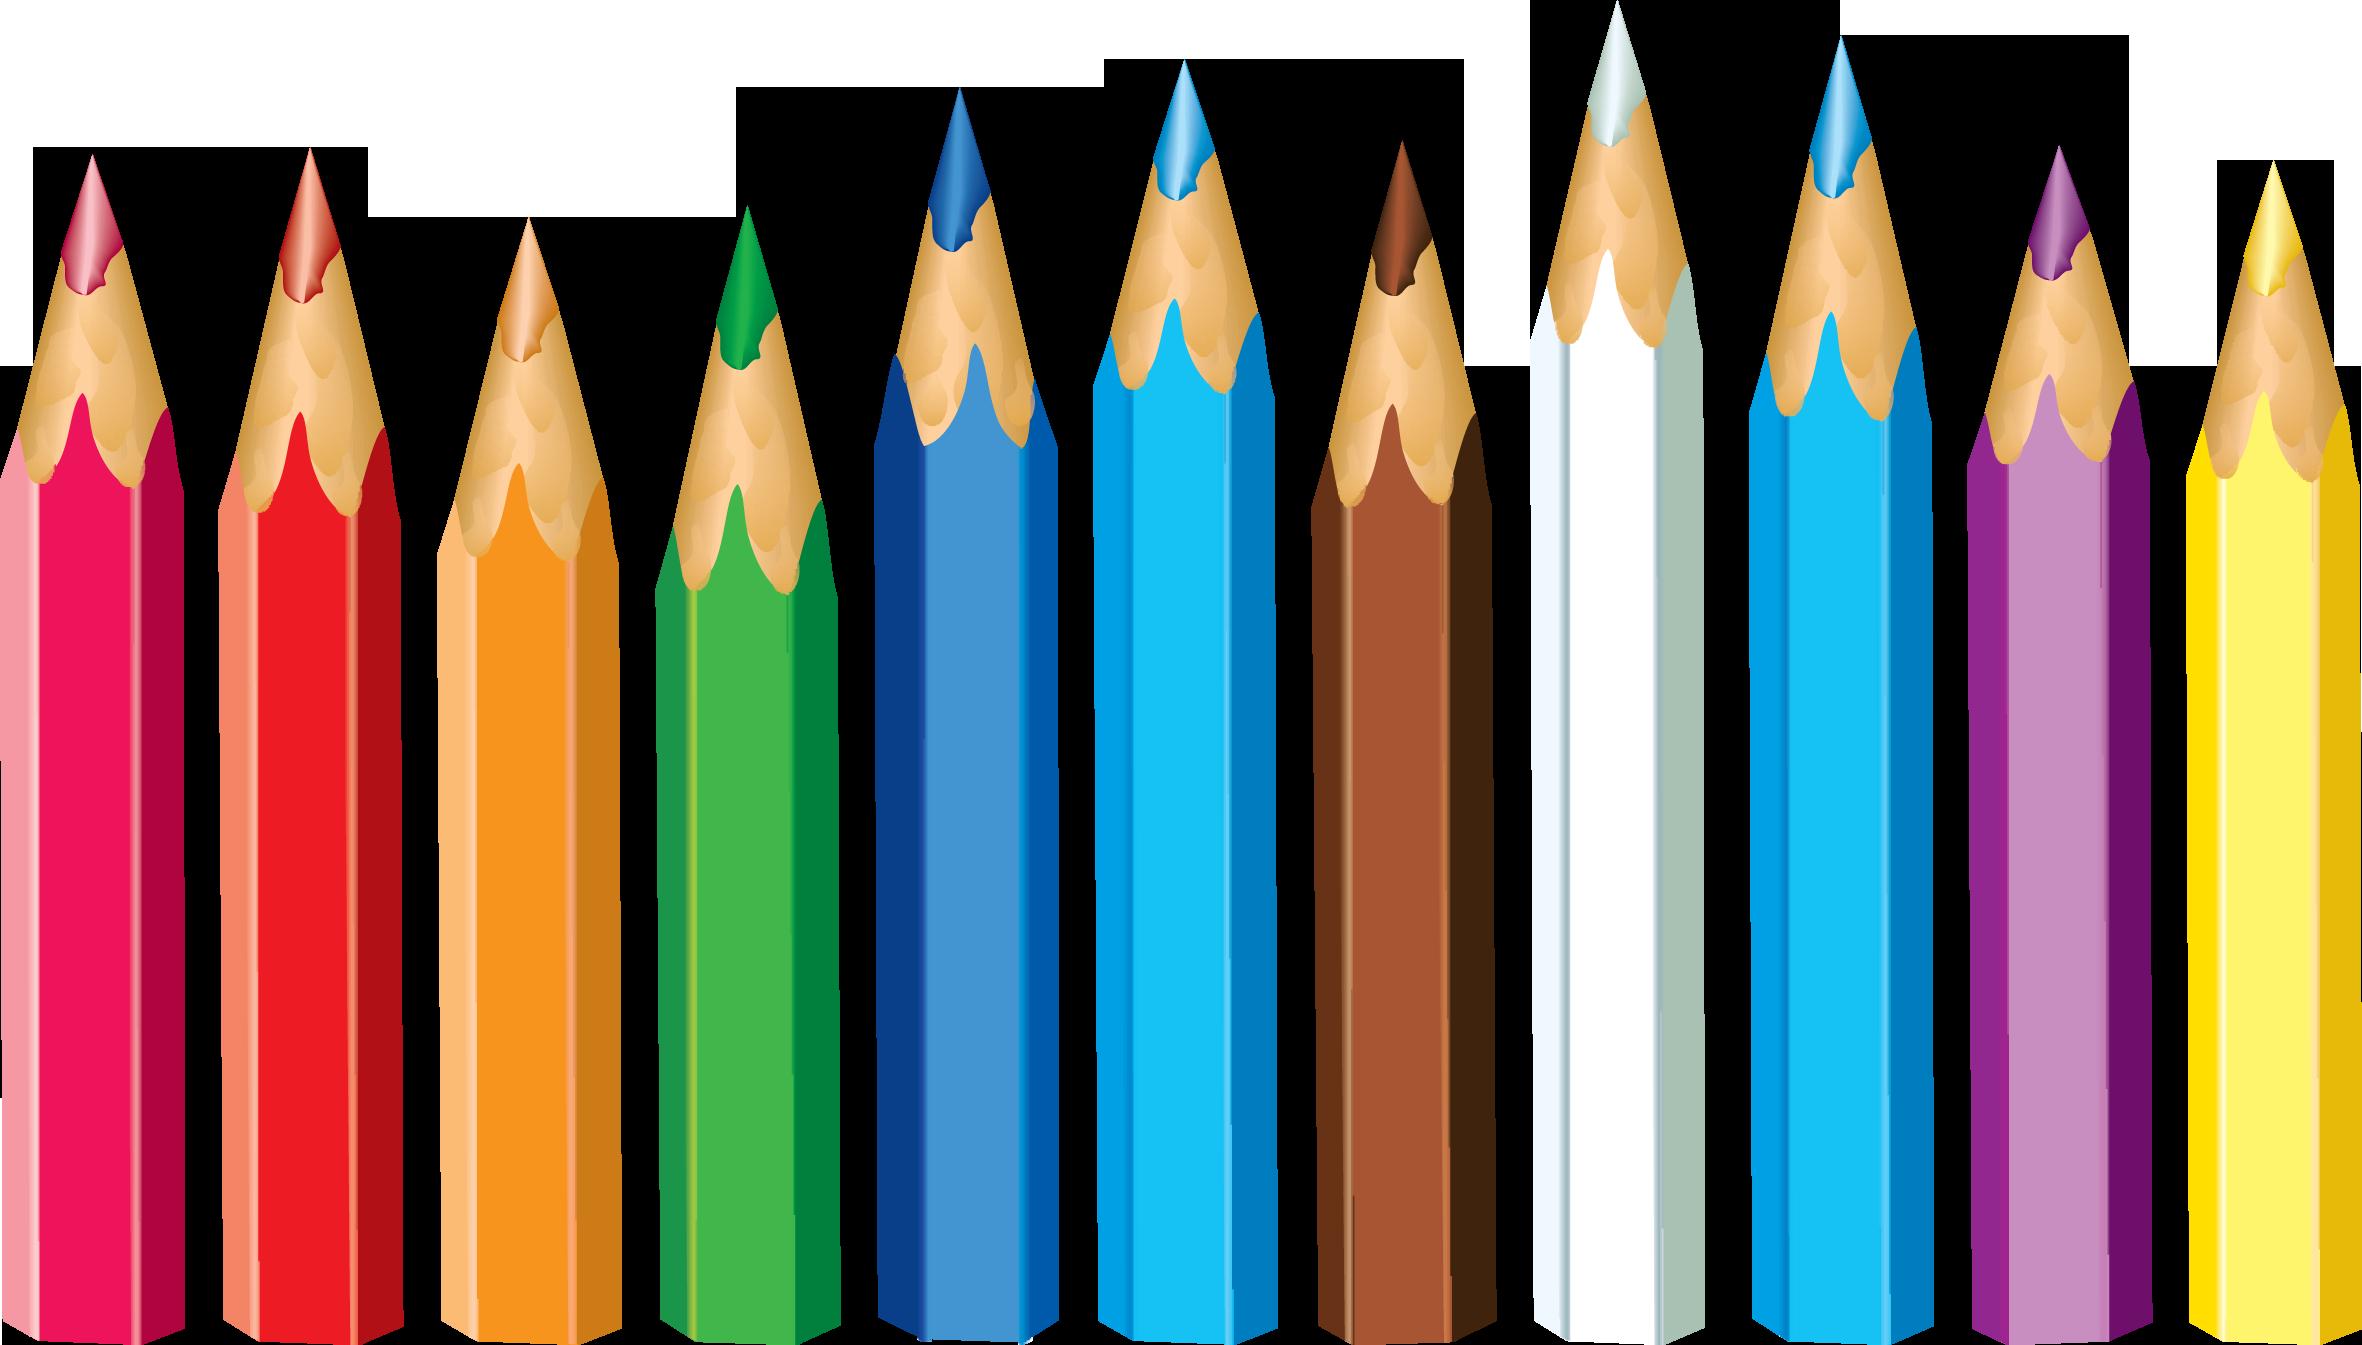 Free 10 Colored Pencil Cliparts, Download Free Clip Art.